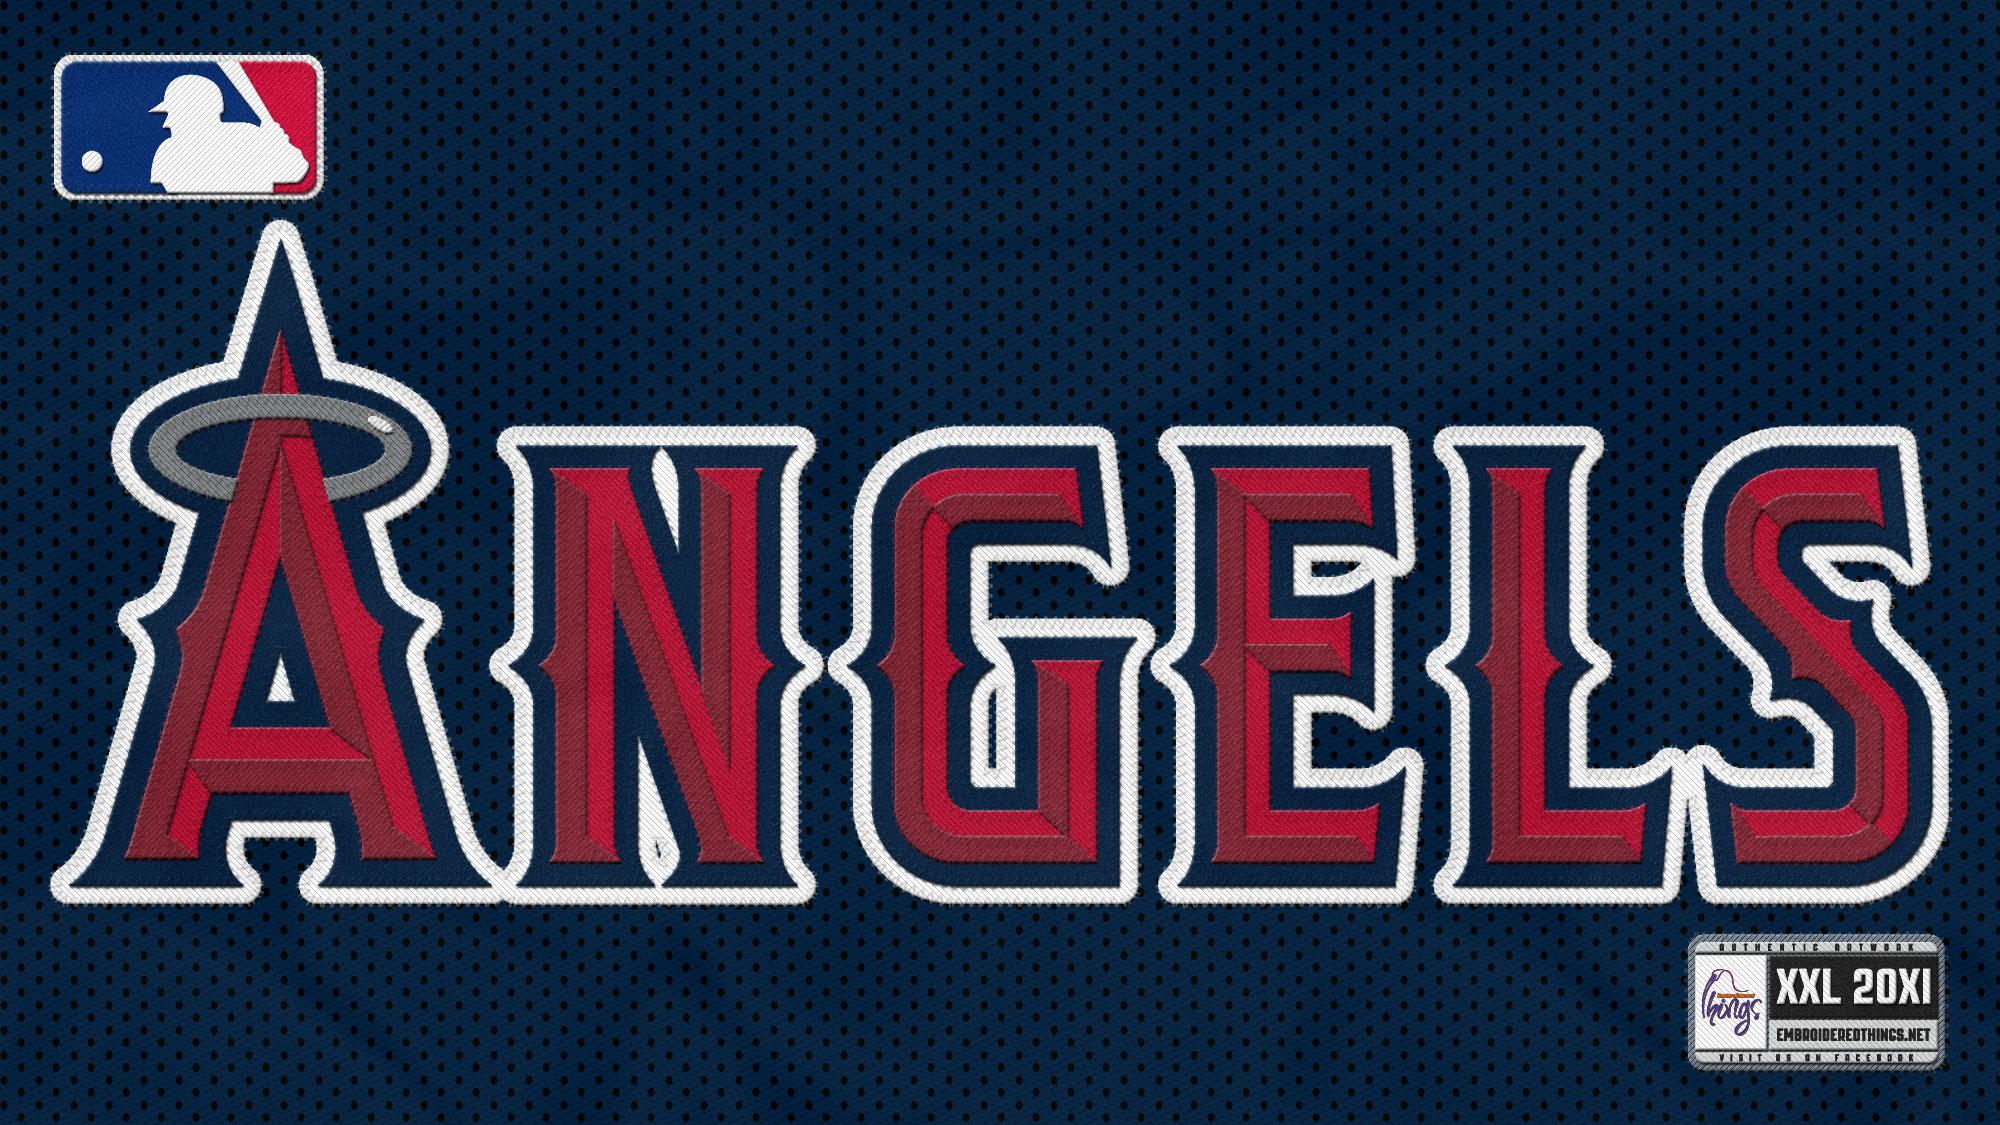 ANAHEIM ANGELS baseball mlb wh wallpaper 2000x1125 2000x1125